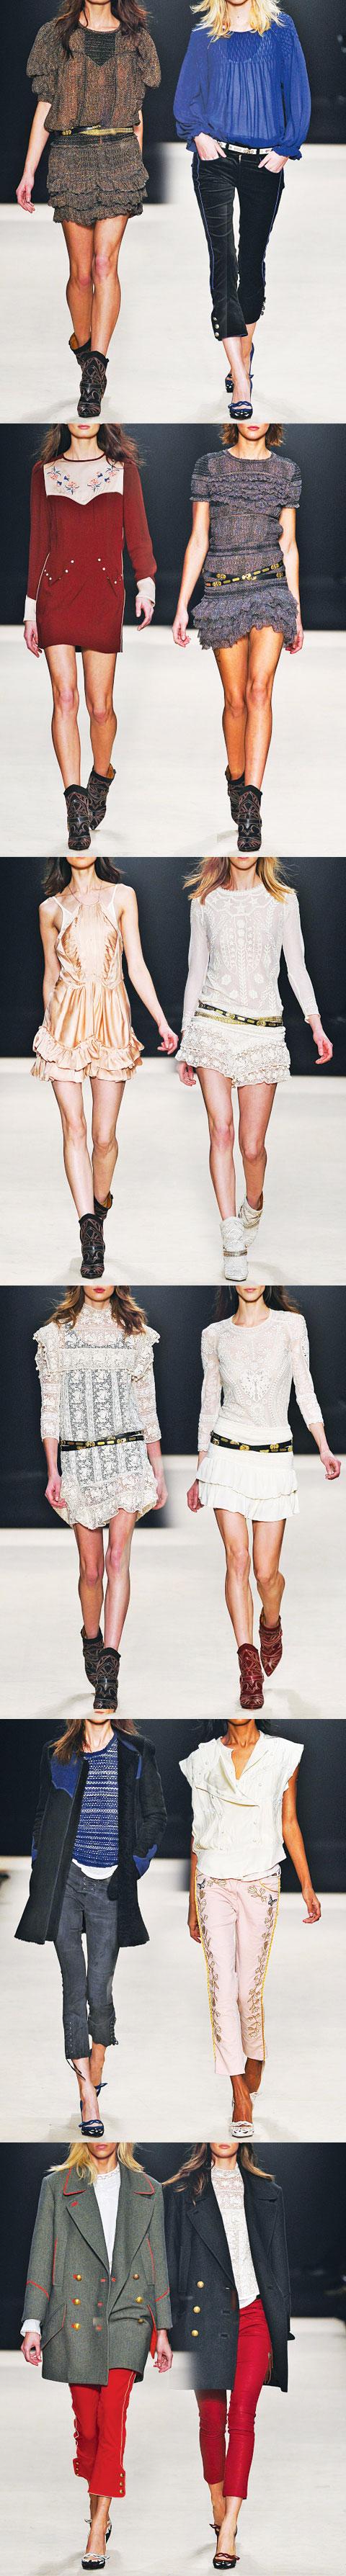 Isabel Marant Fashion Week 2012 LookBook {via M'oda 'Operandi}